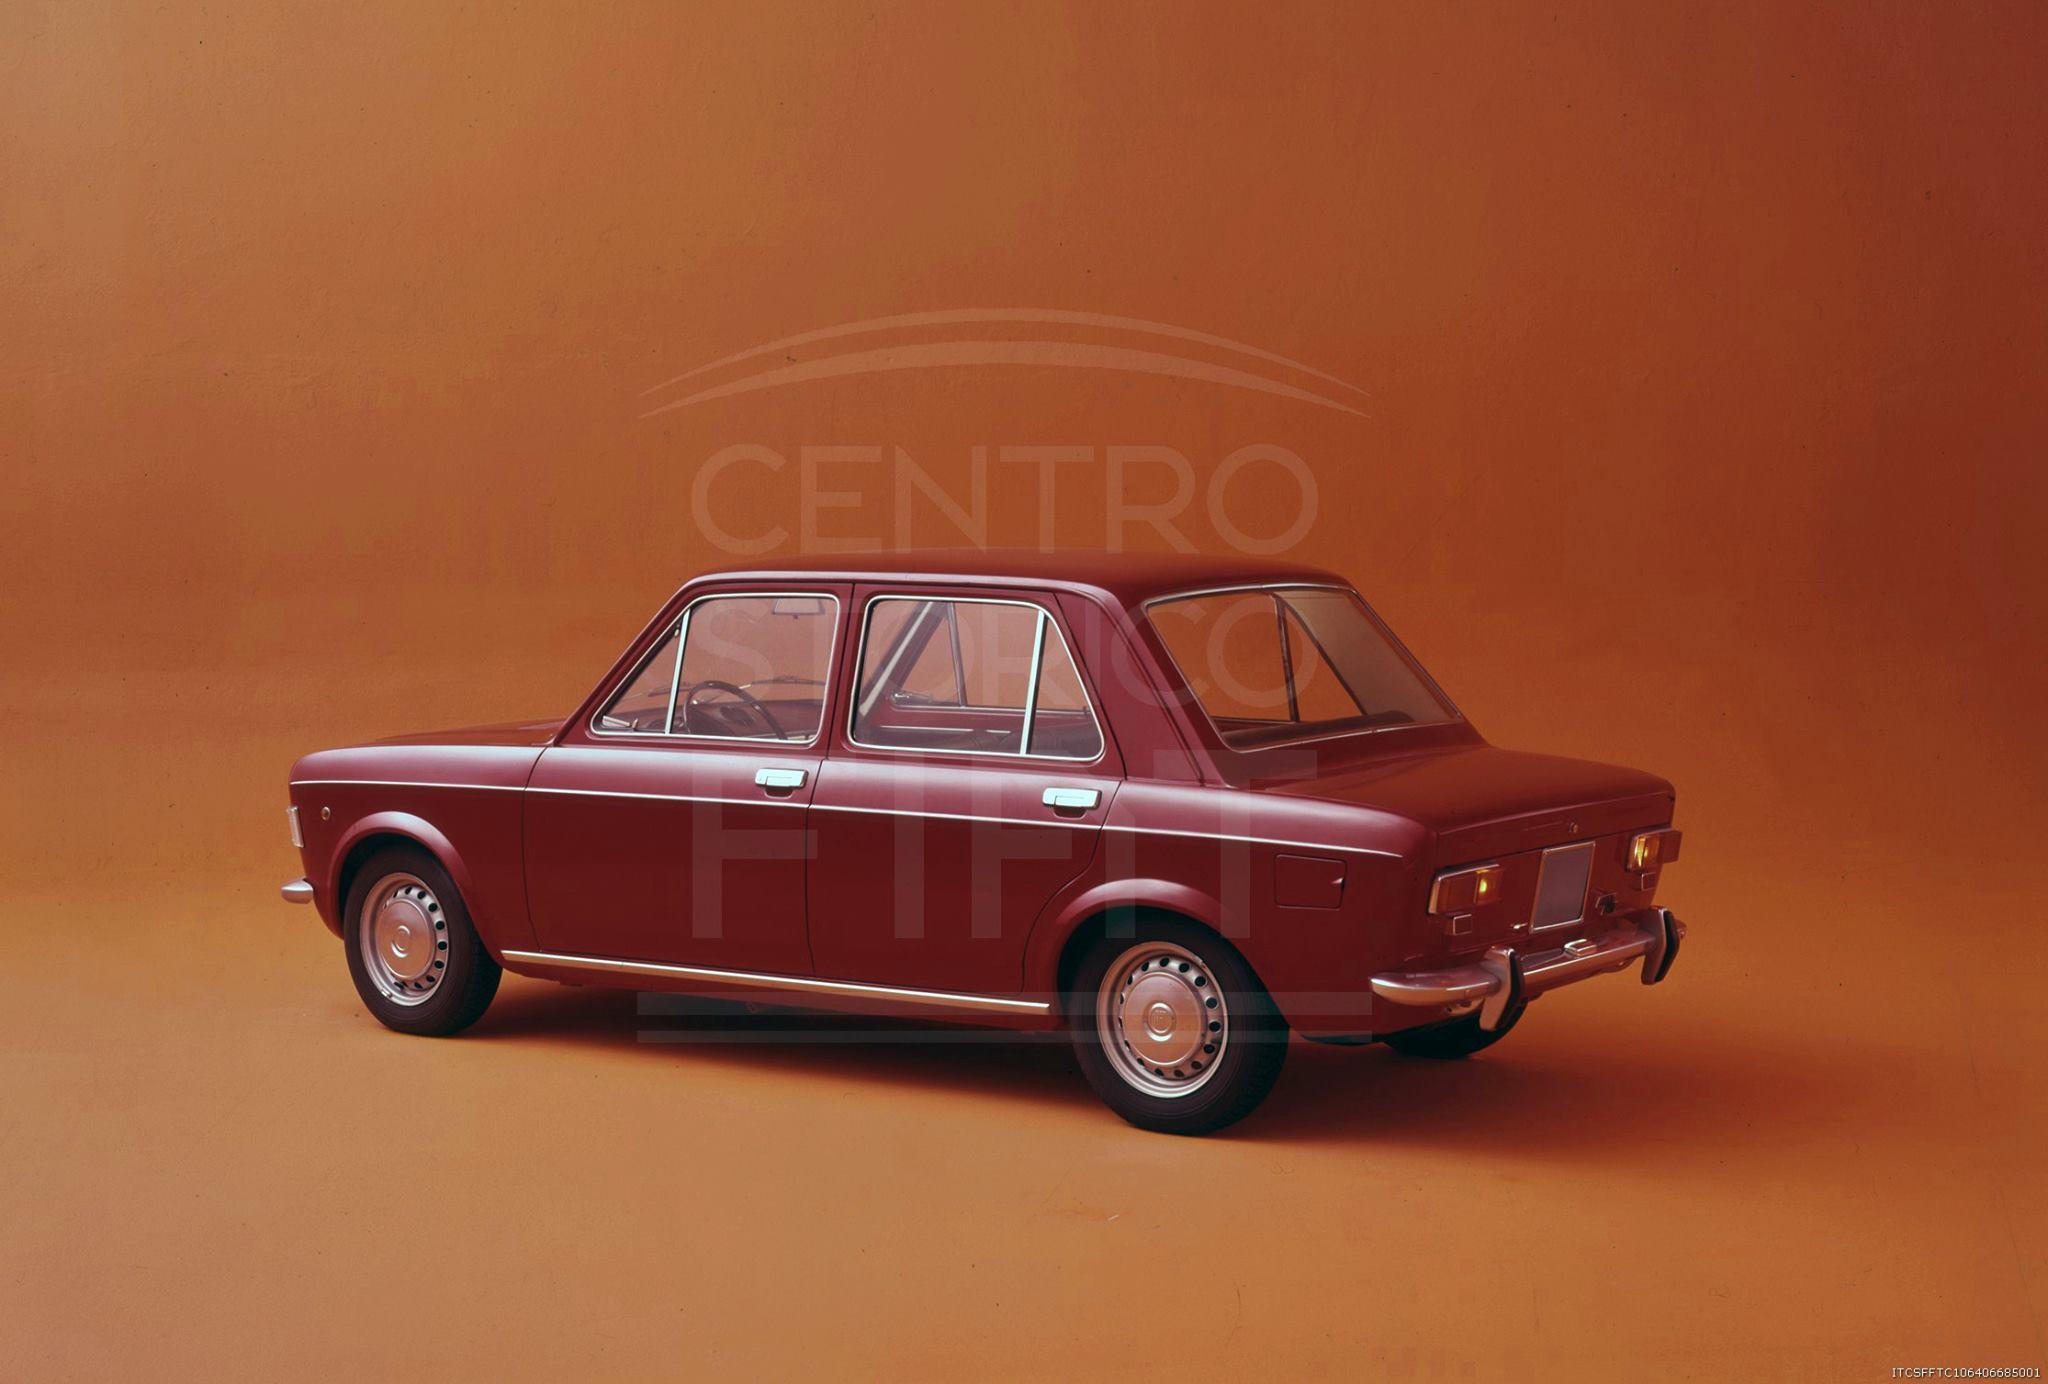 1969_Fiat128-4porte.jpg